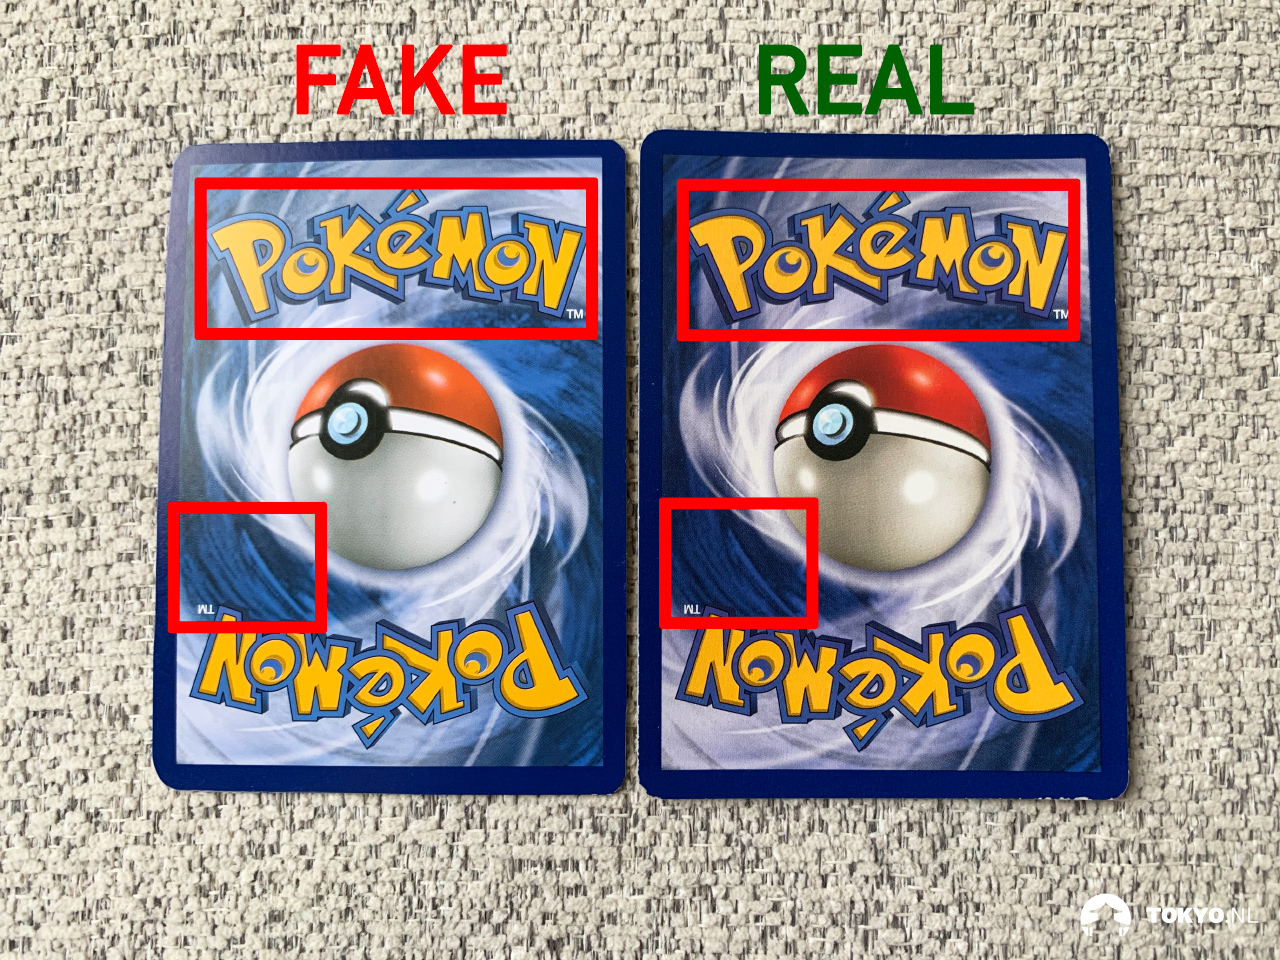 Kleurcodes neppe Pokémon kaarten